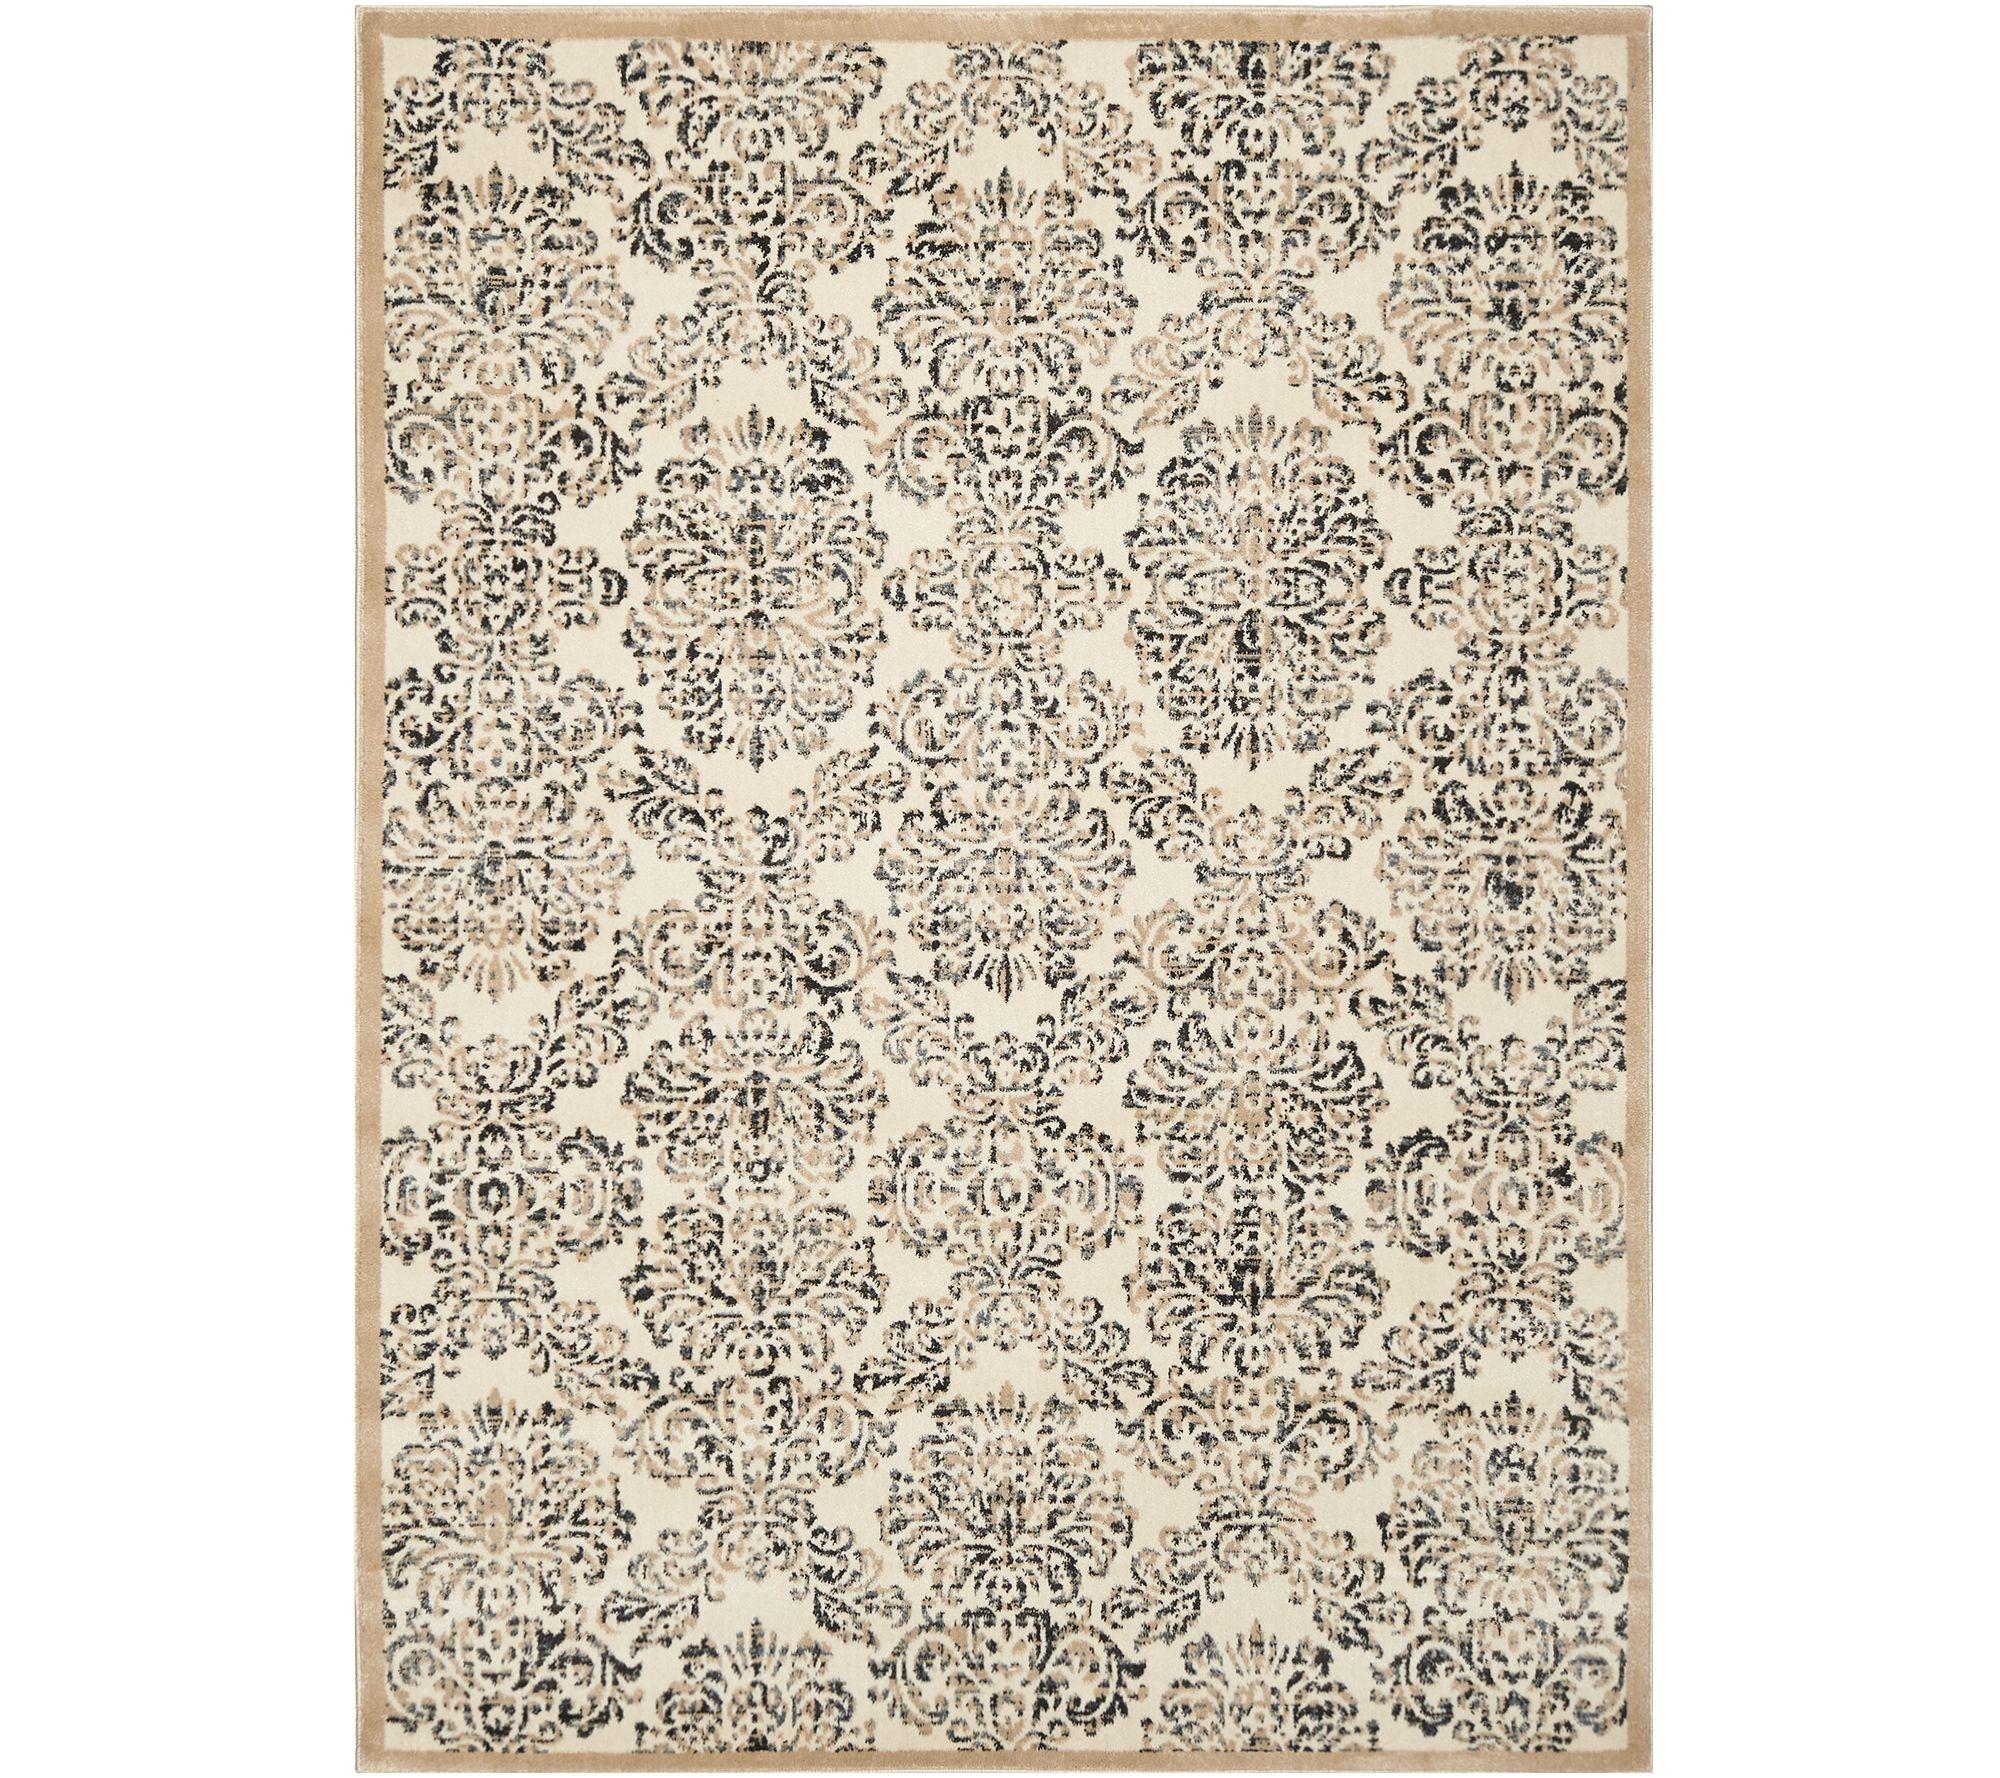 home decor 5 x7 vintage damask area rug page 1 qvc com